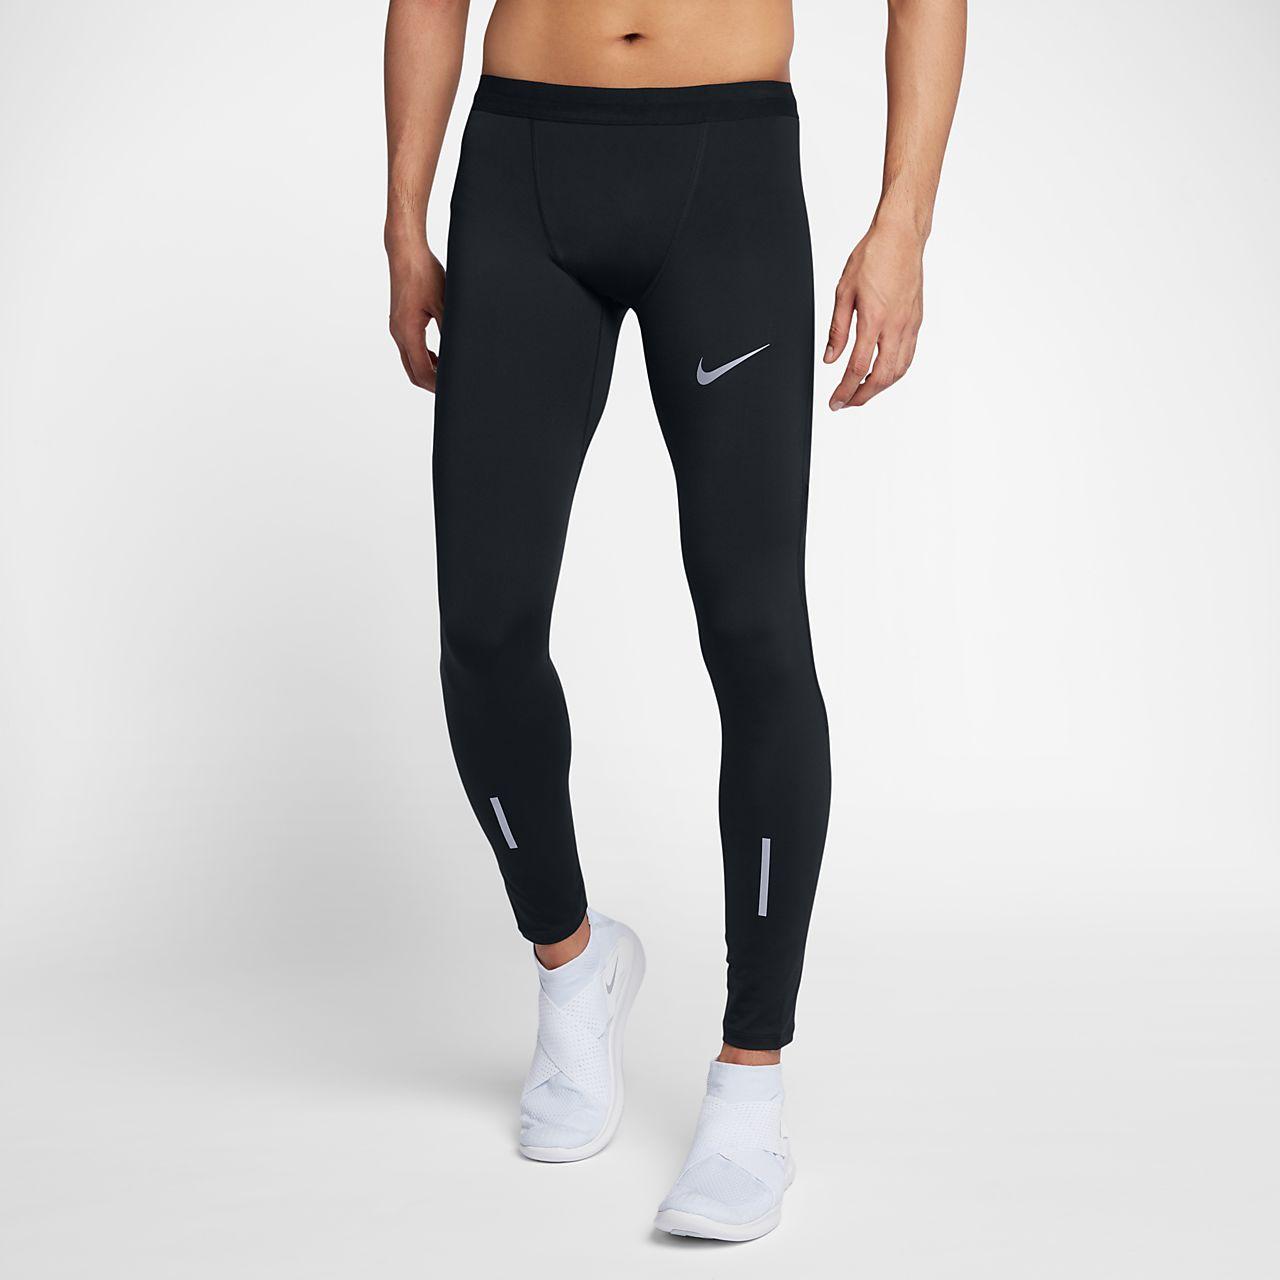 Nike Tech Herren ca. 72 cm Nike Tech